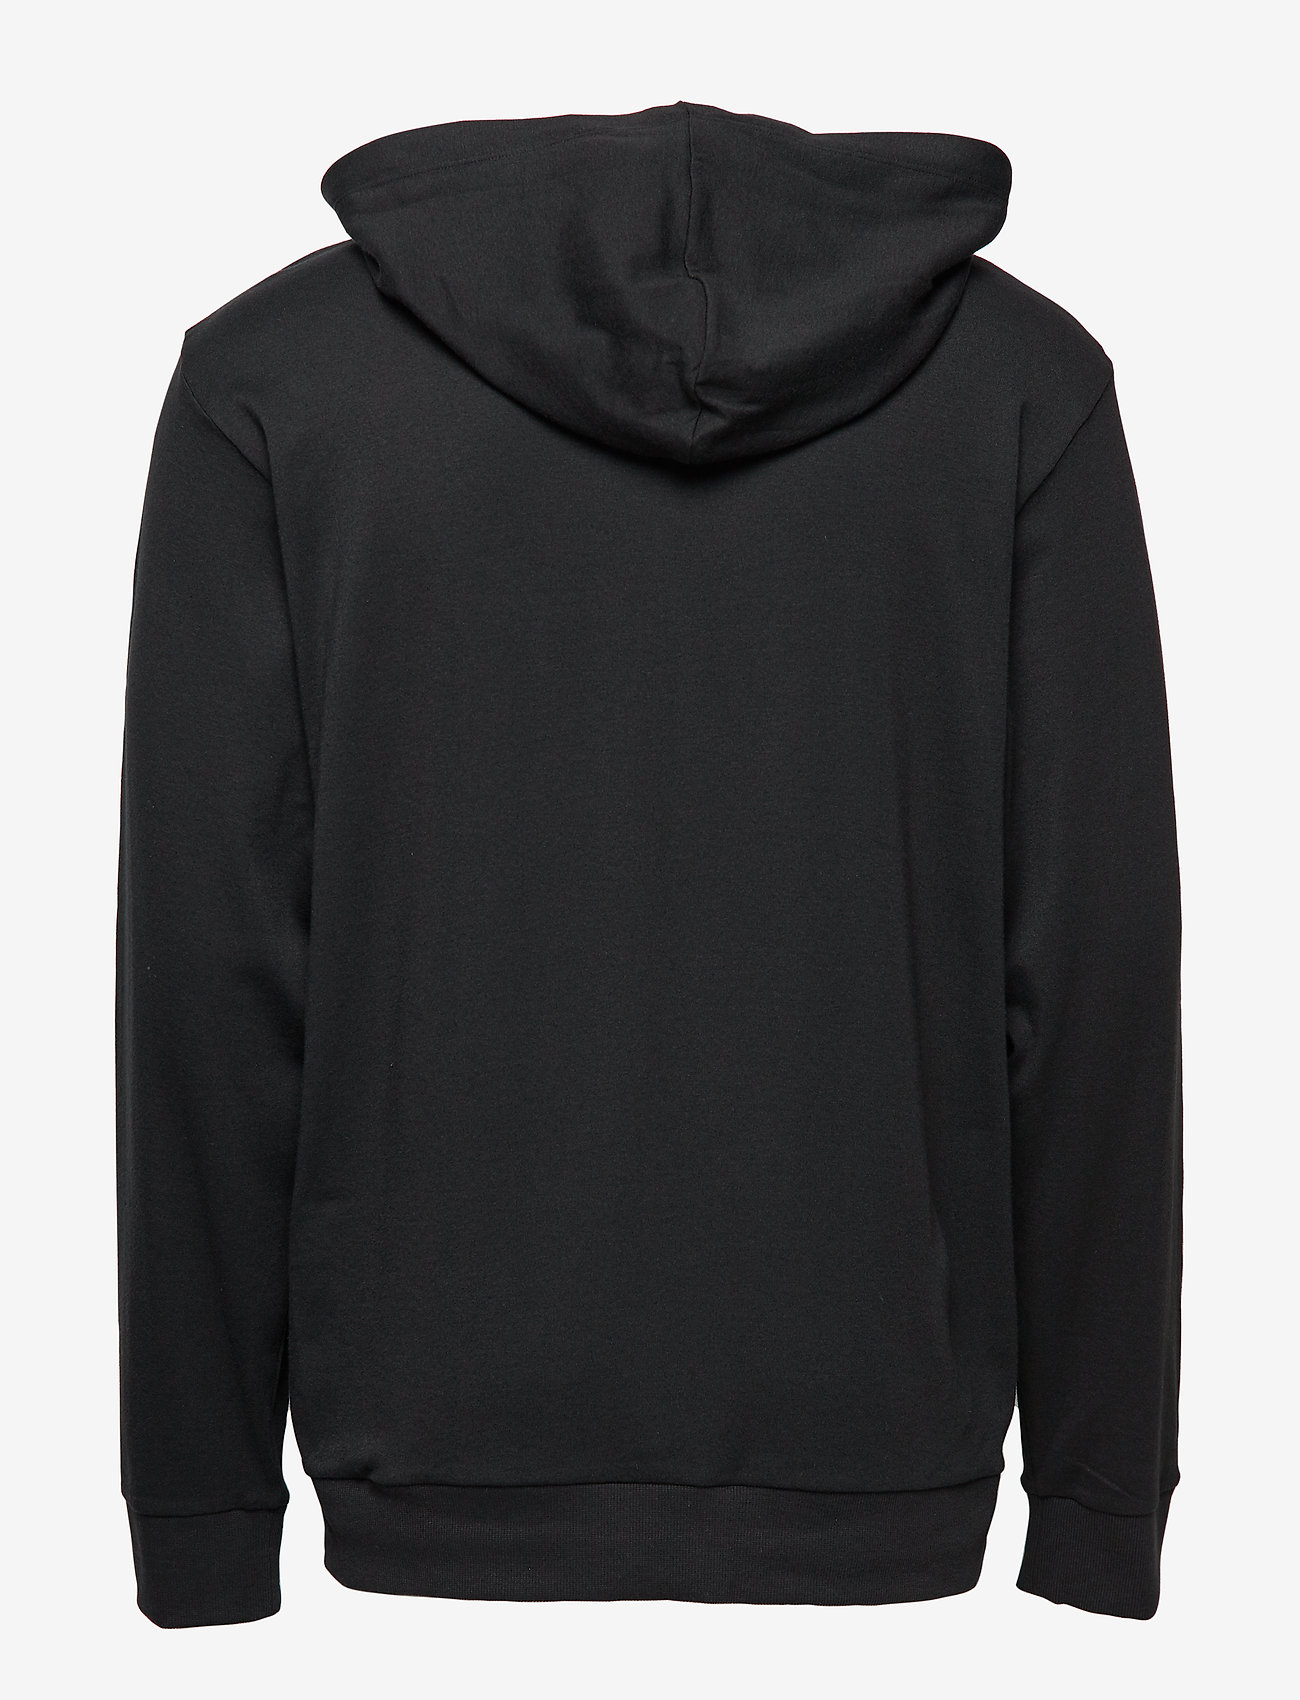 Calvin Klein - FULL ZIP SWEATSHIRT - hoodies - black - 1